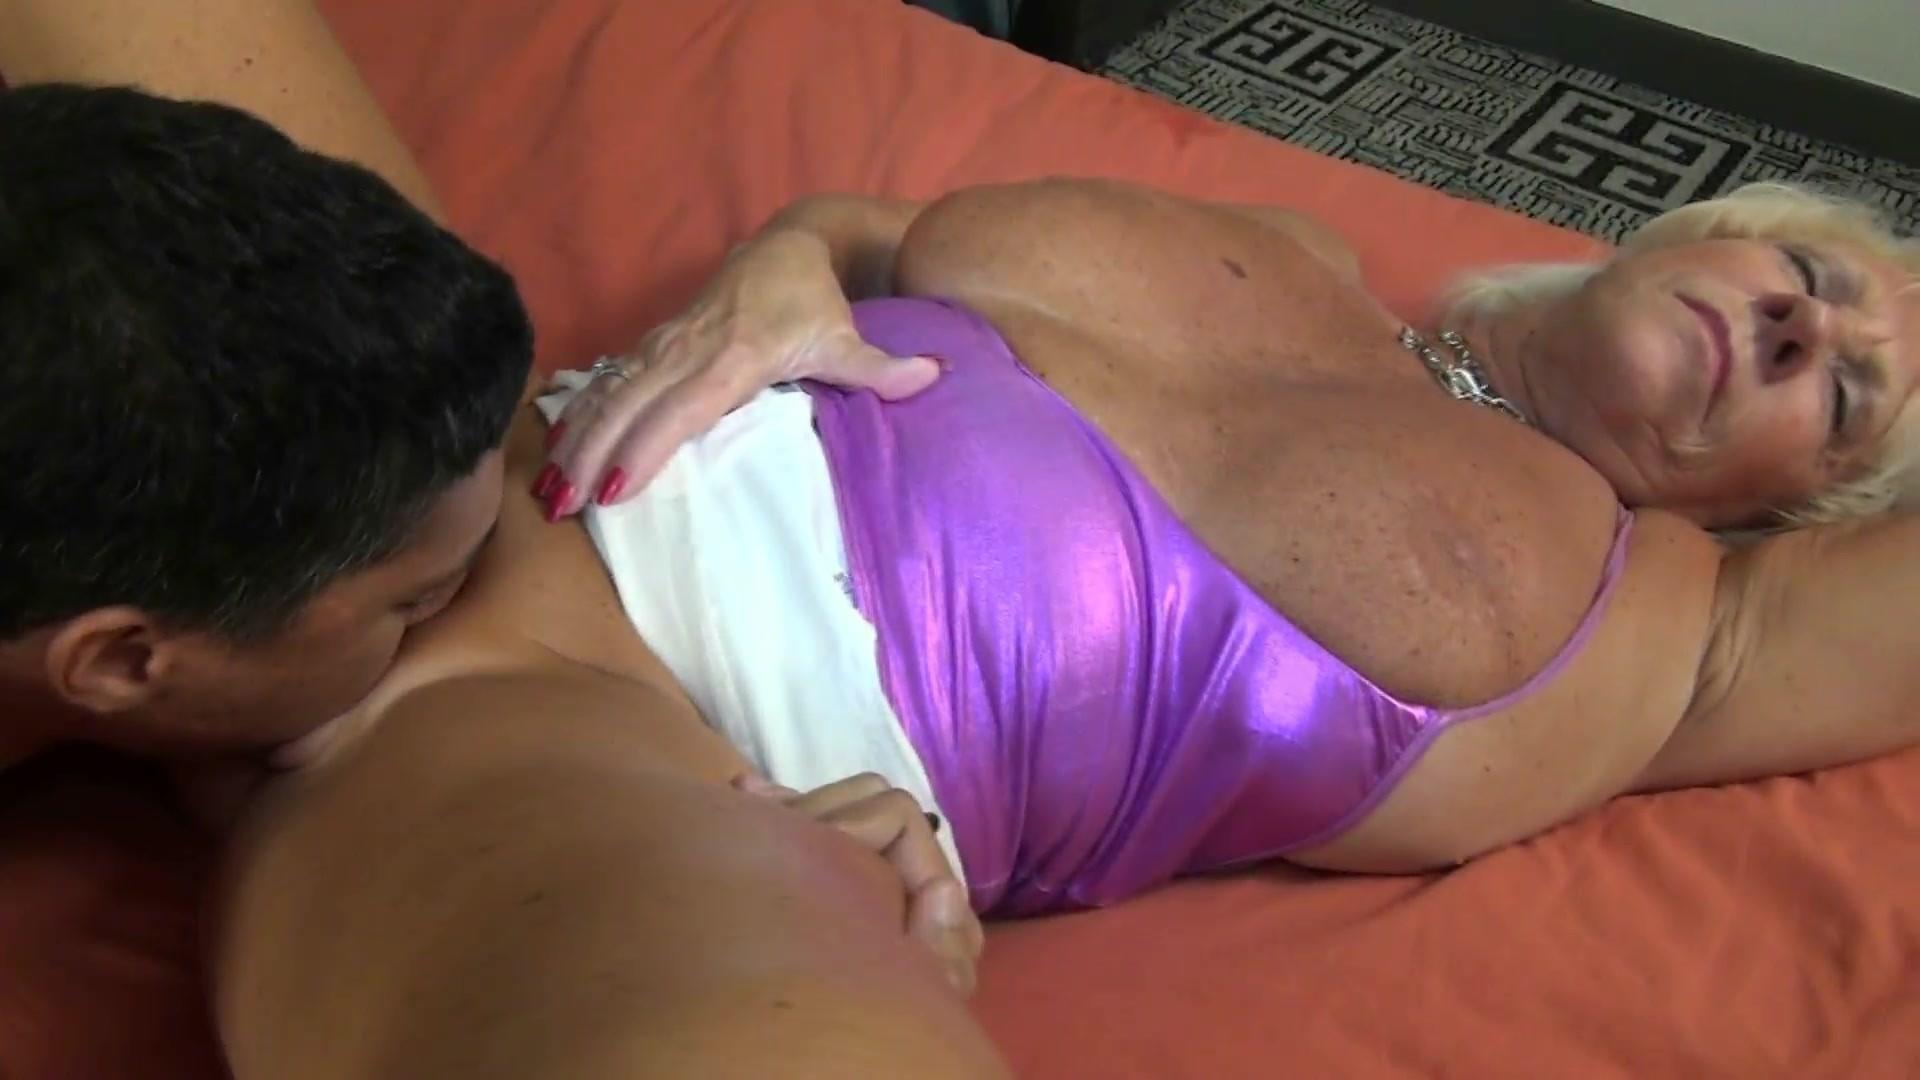 Random acts of pornography videos on demand adult empire